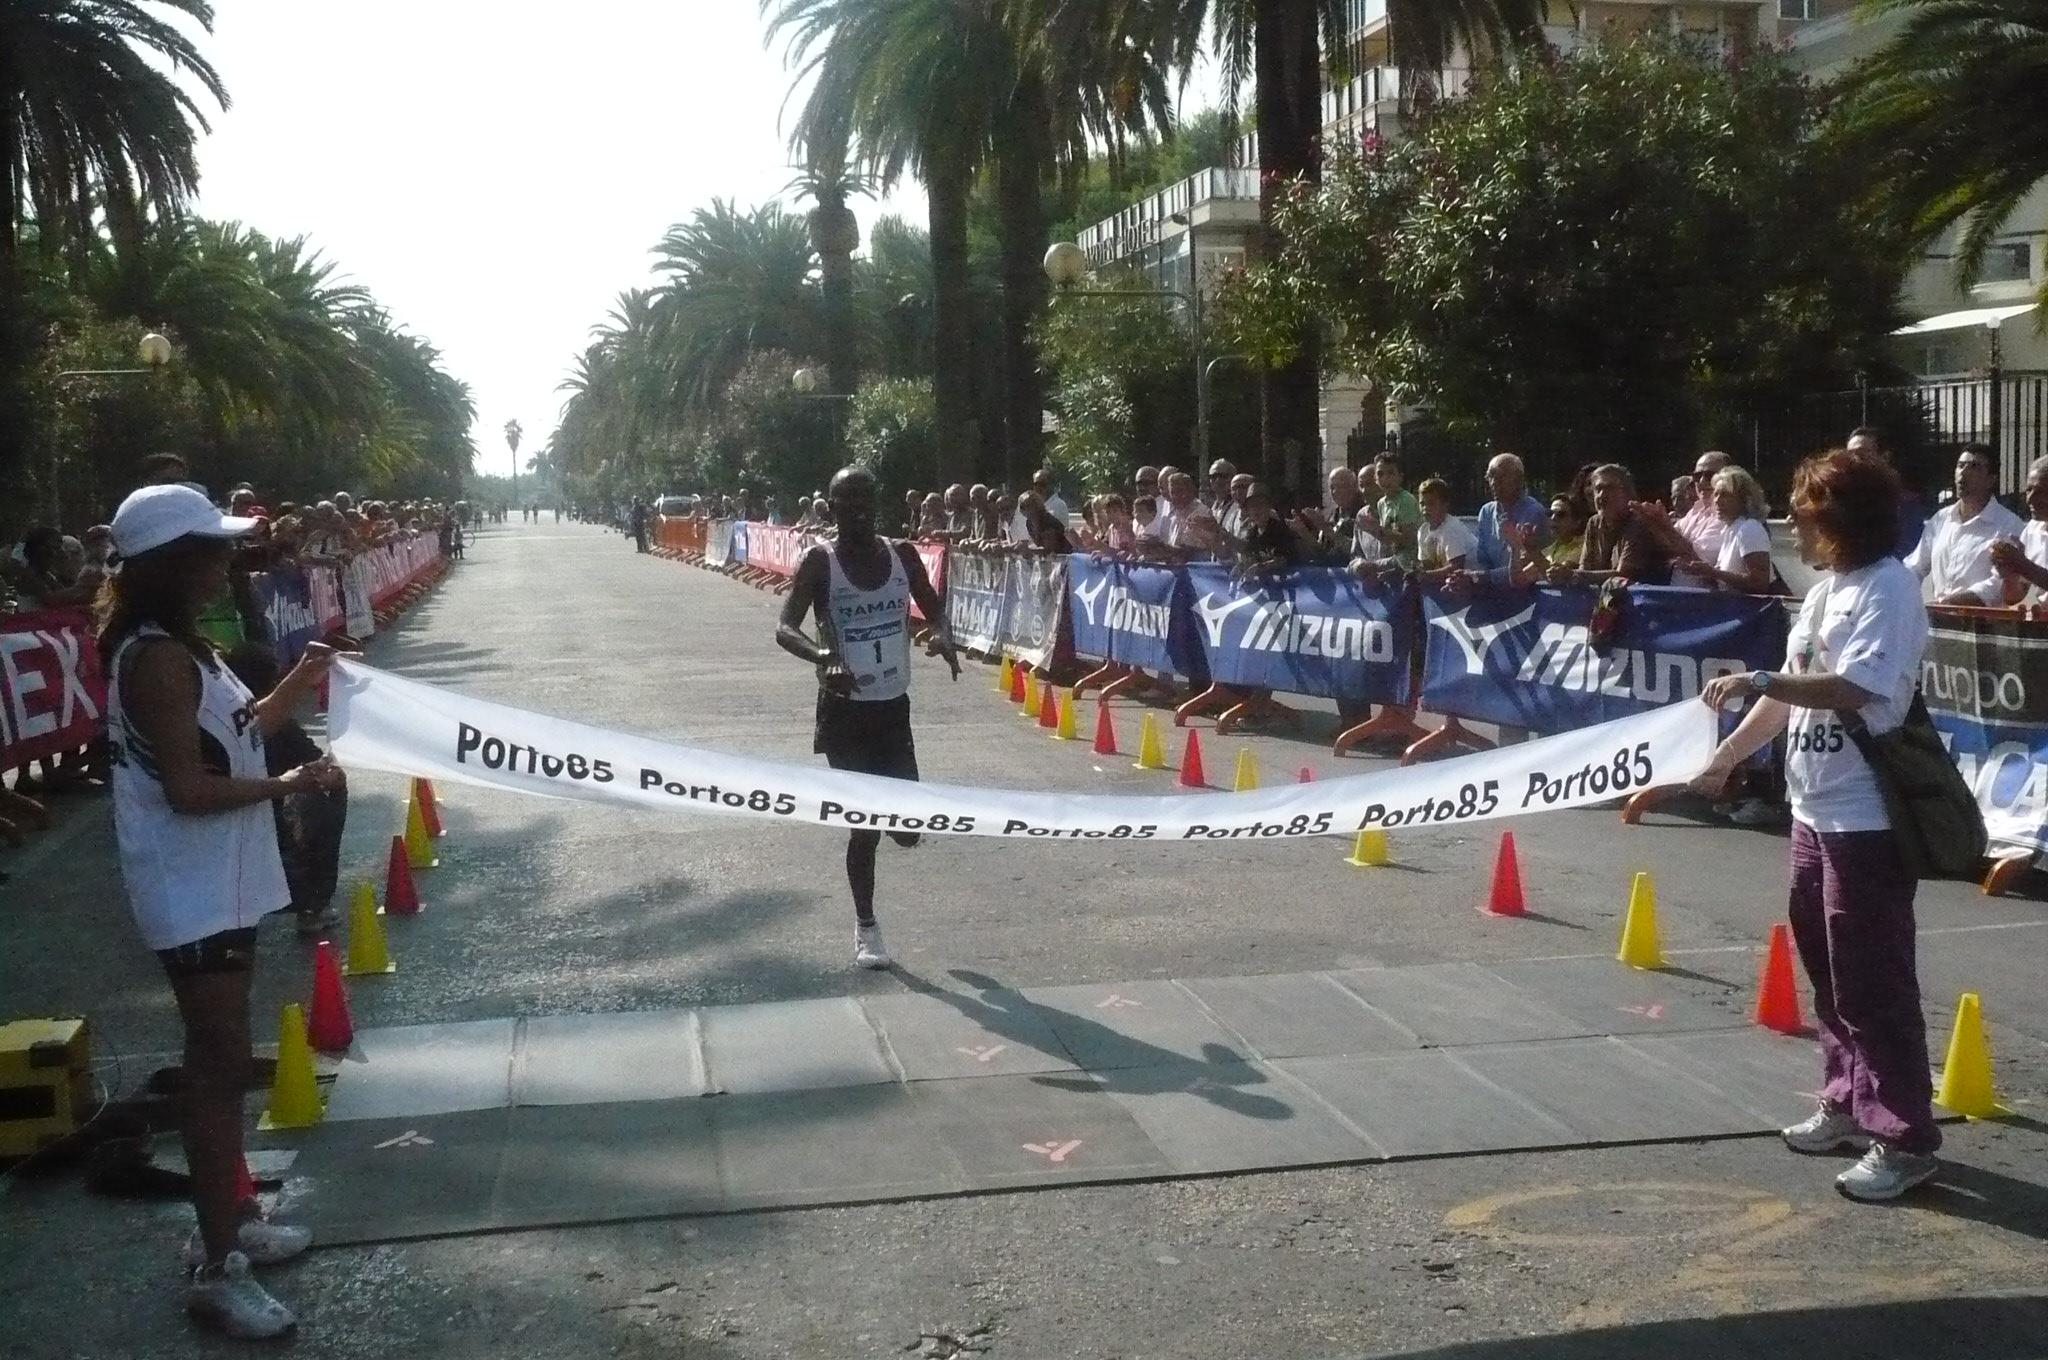 Maratonina Ascoli-San Benedetto, Solomon Yego